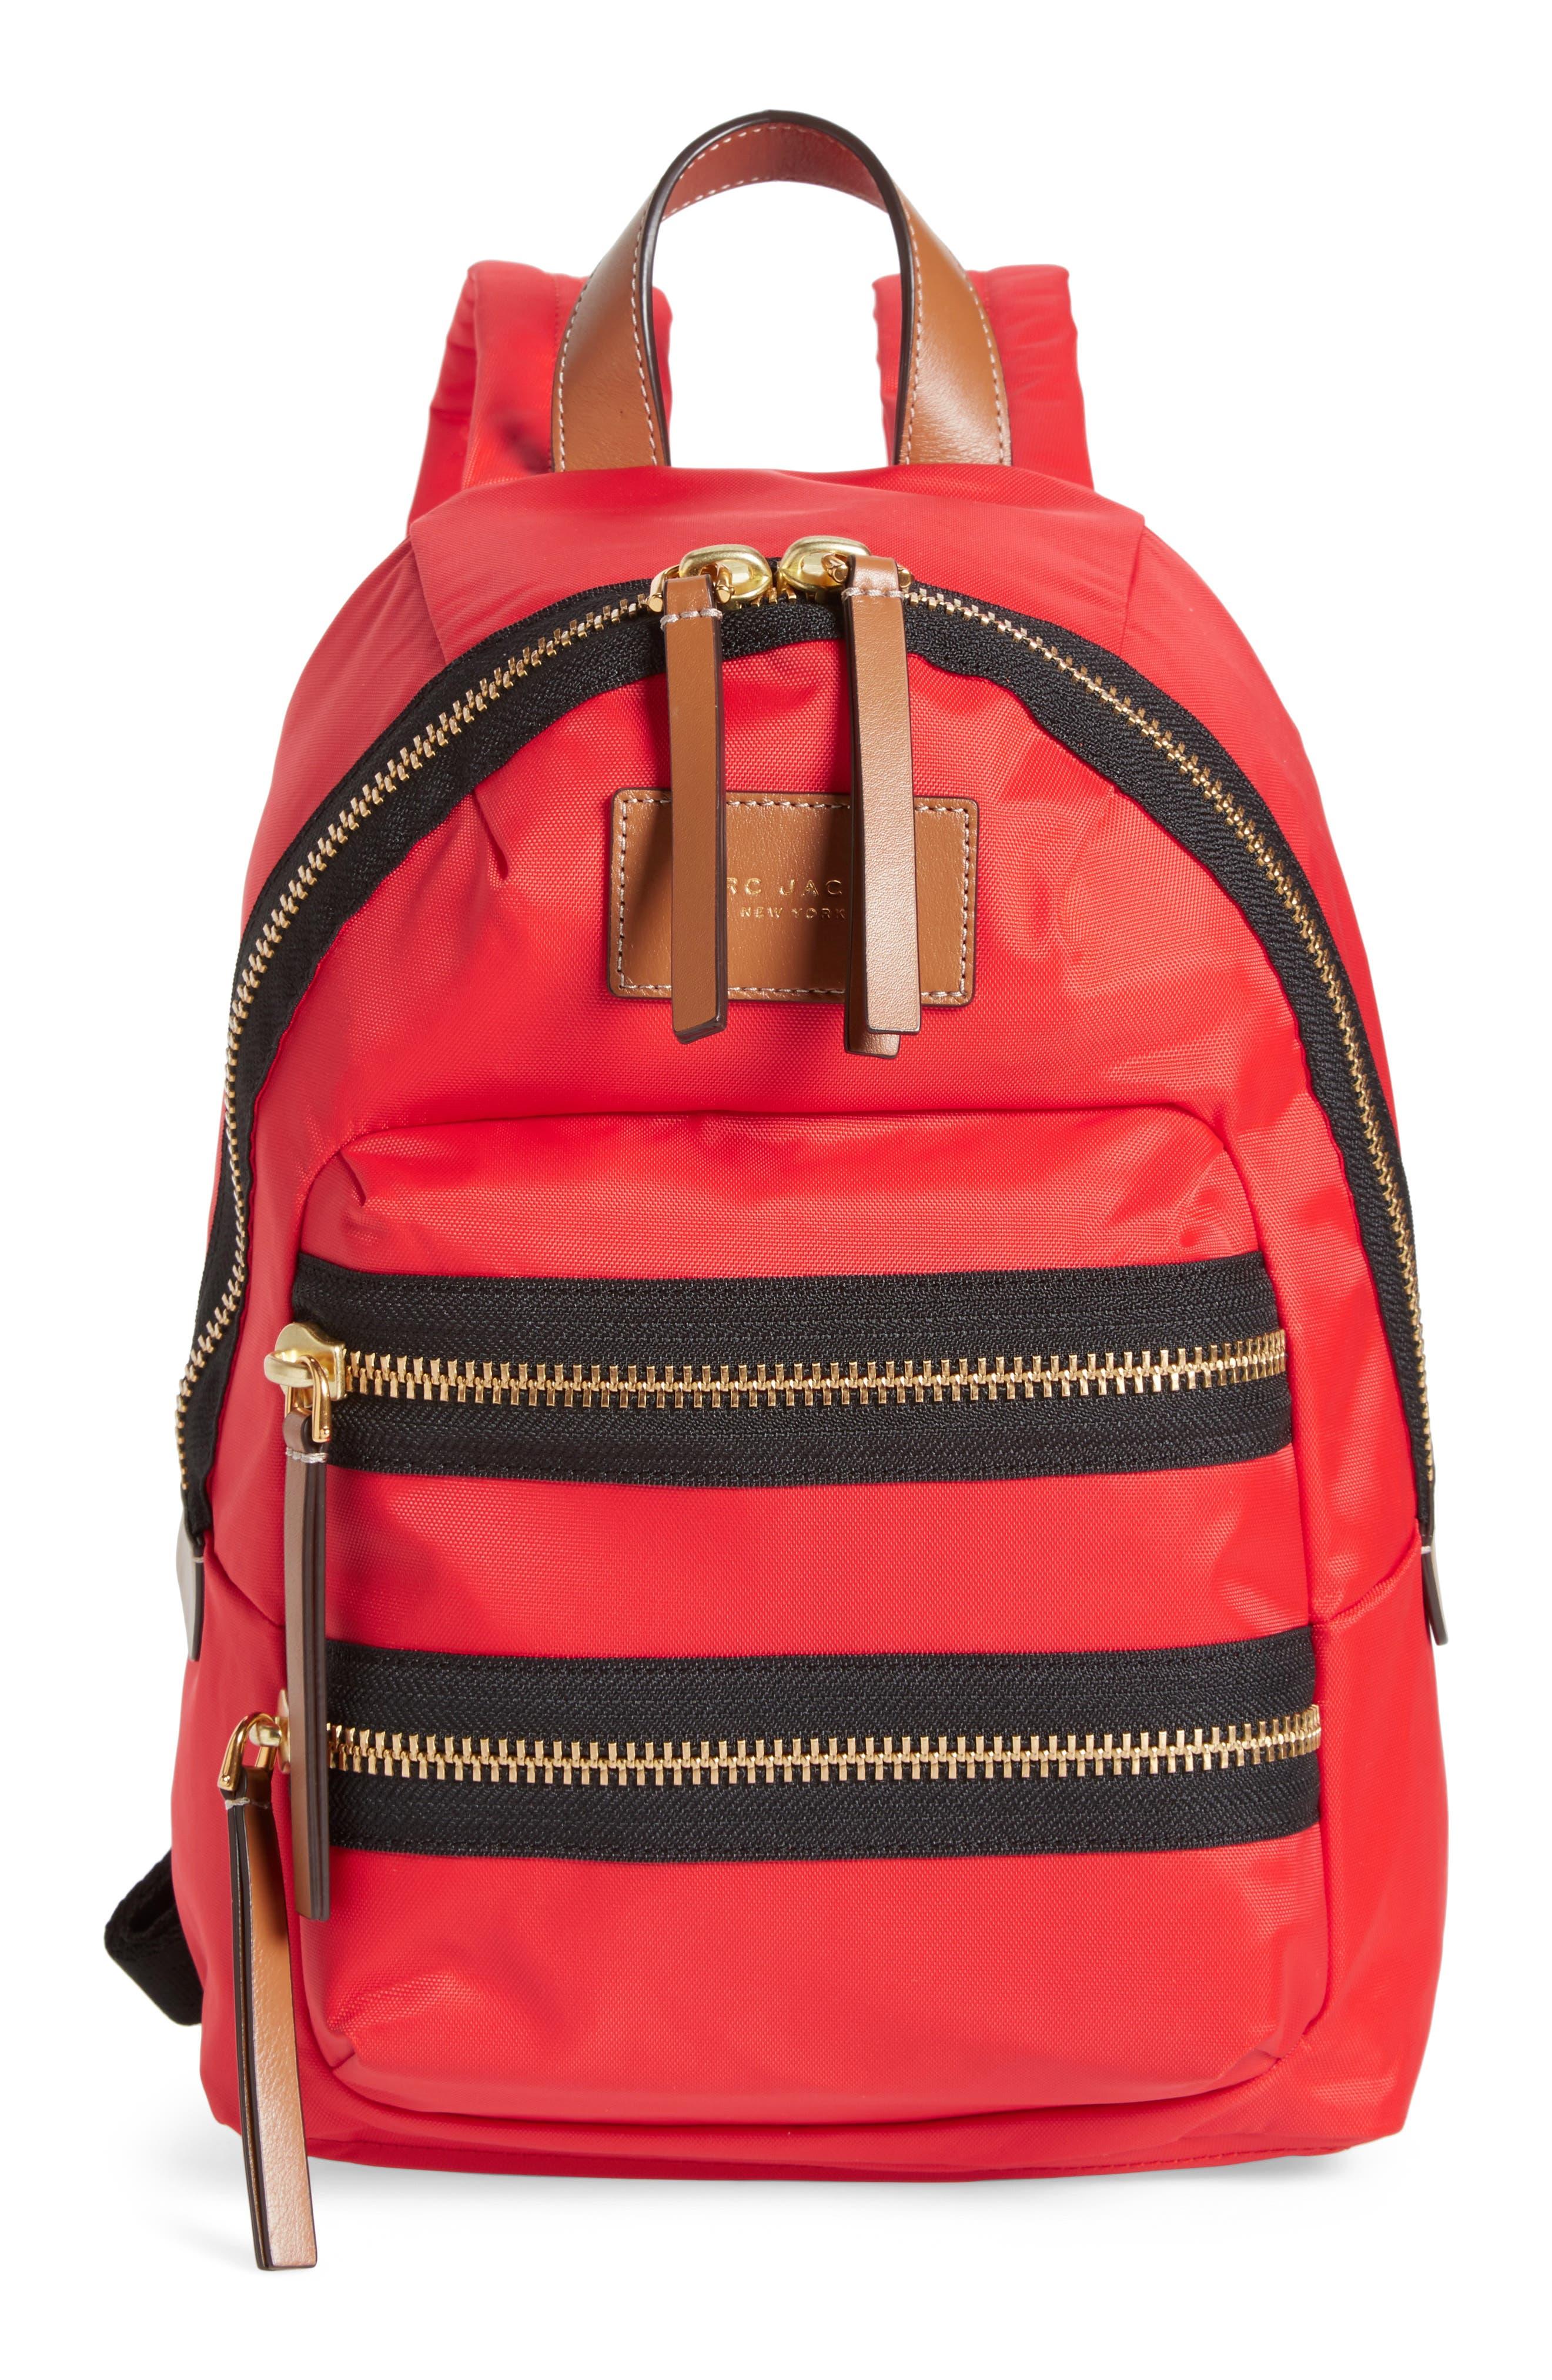 MARC JACOBS 'Mini Biker' Nylon Backpack